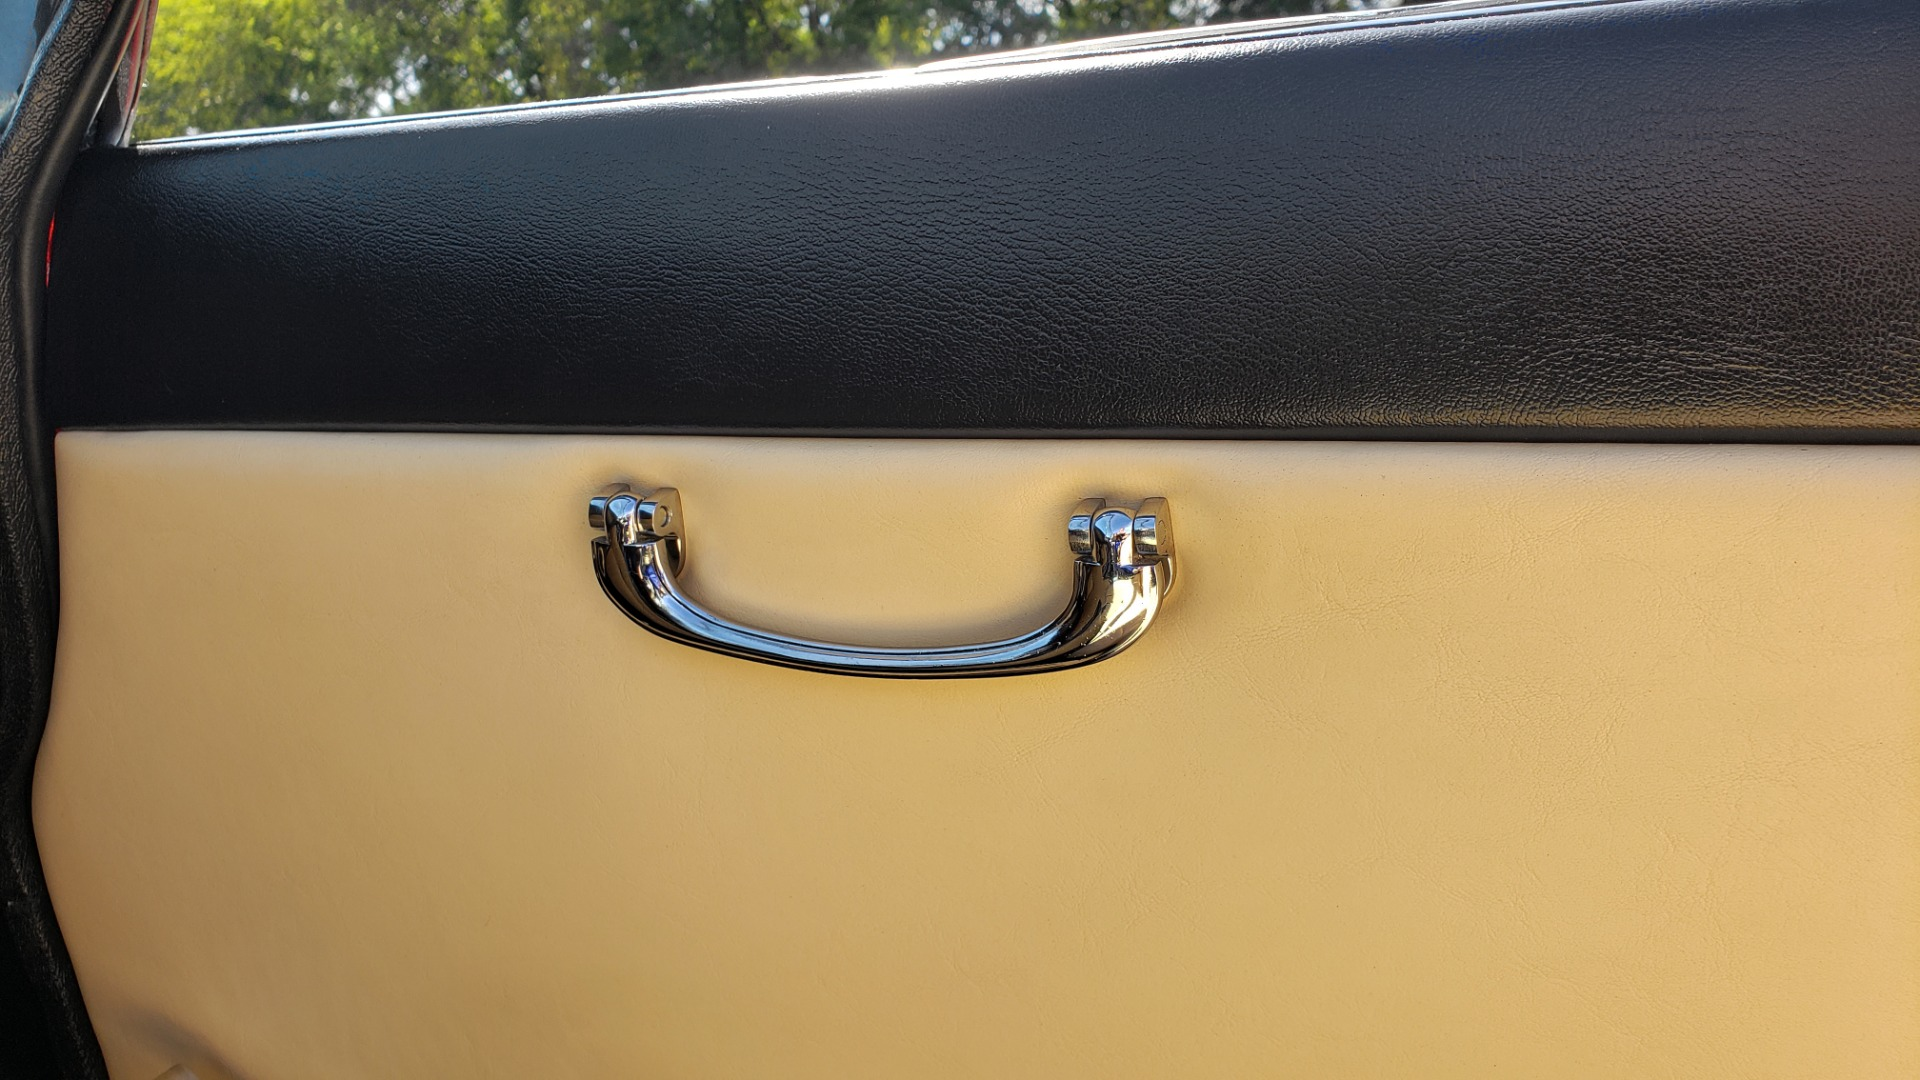 Used 1961 Ferrari 250GT SWB CALIFORNIA REPLICA / 302CI V8 / TREMEC 5-SPEED for sale Sold at Formula Imports in Charlotte NC 28227 48